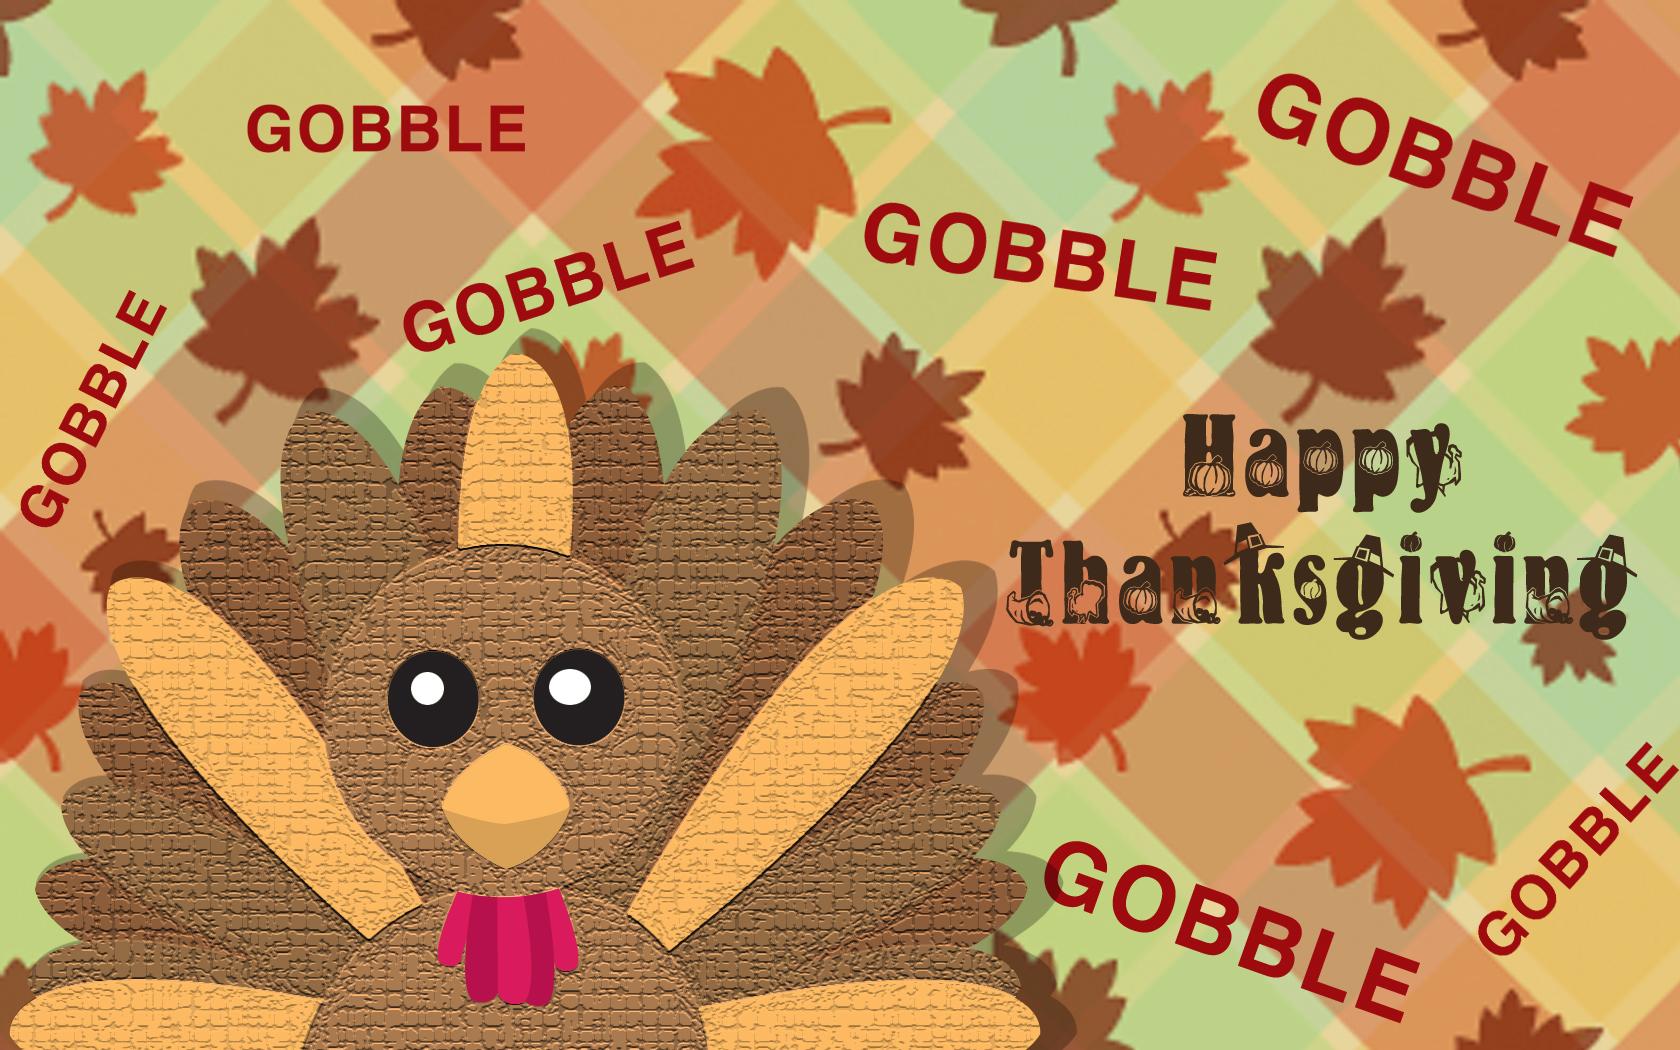 Thanksgiving Wallpapers Funny Hd Hd Desktop Wallpapers 4k Hd